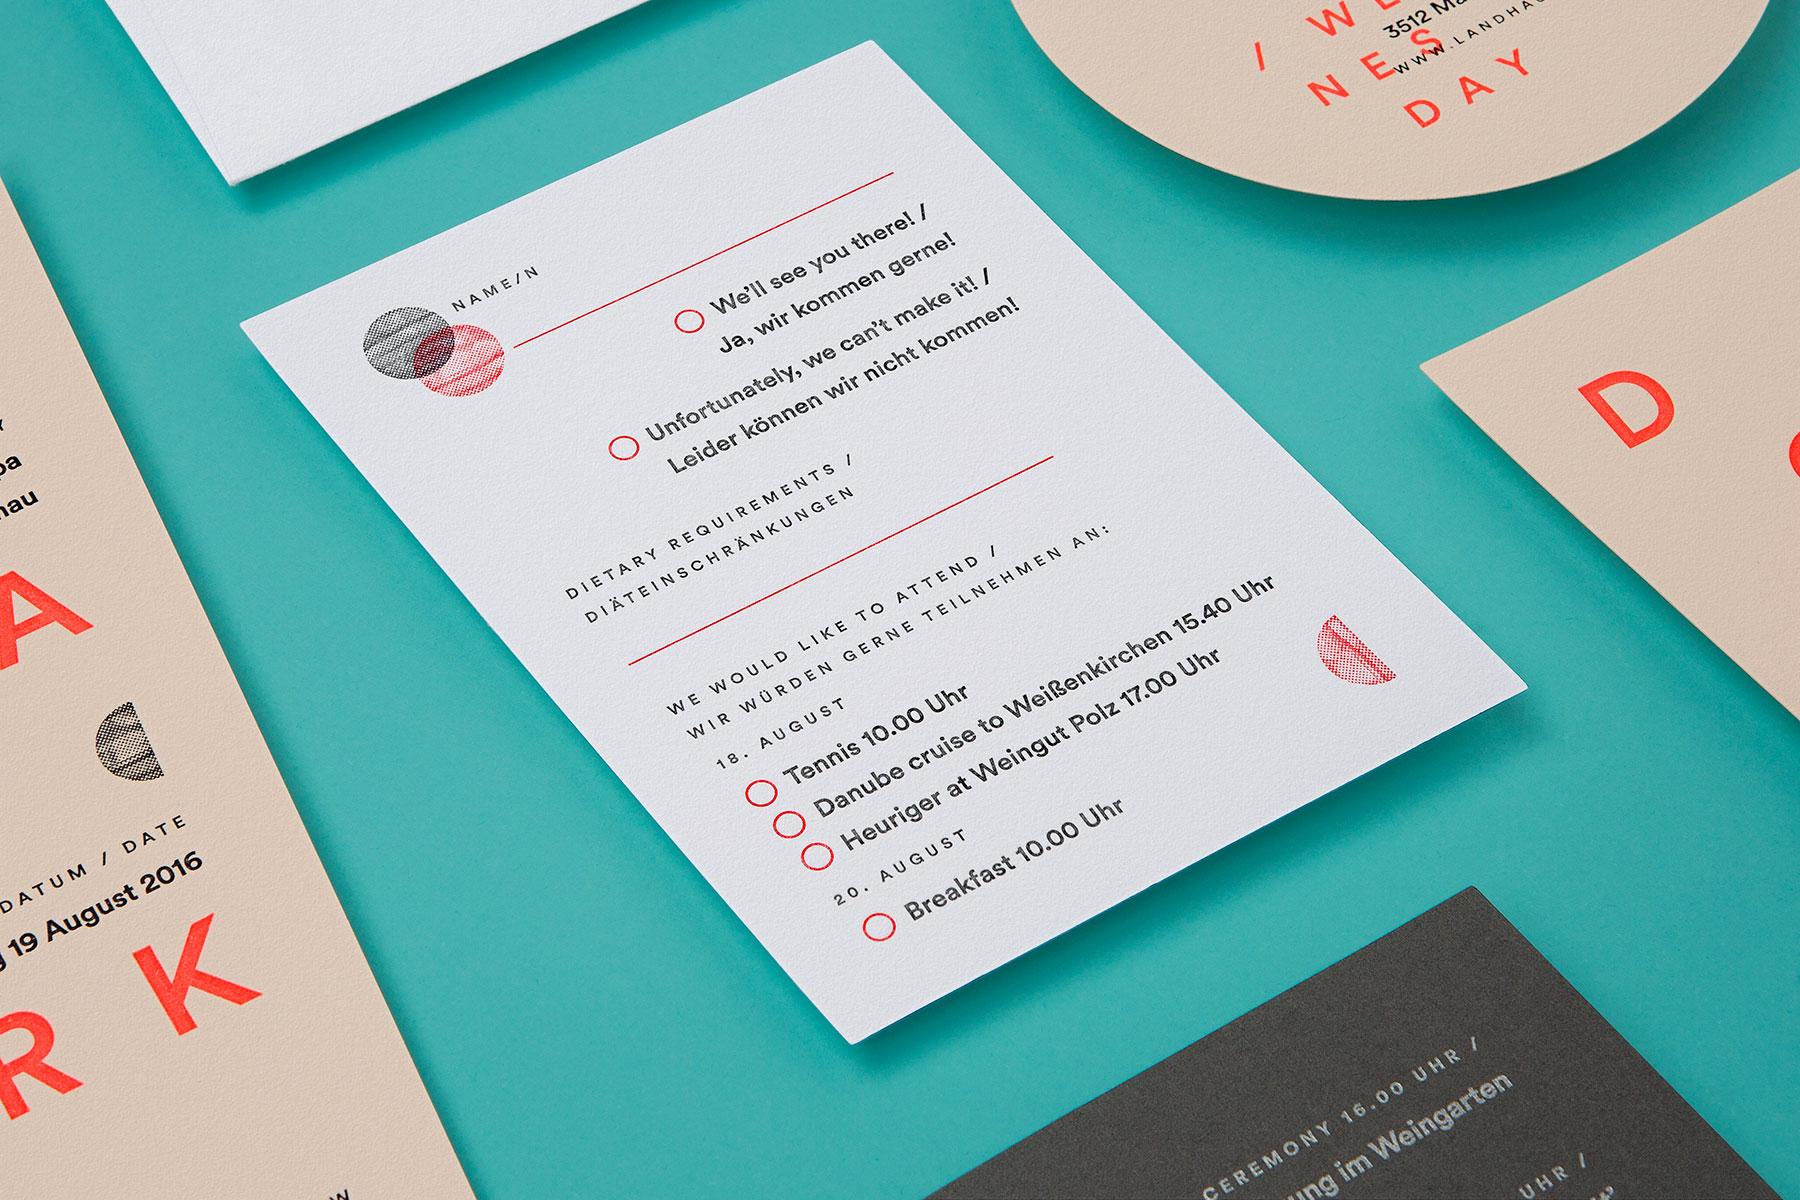 Modern minimalist letterpress wedding invitations for Julia and Mark on Colorplan 3